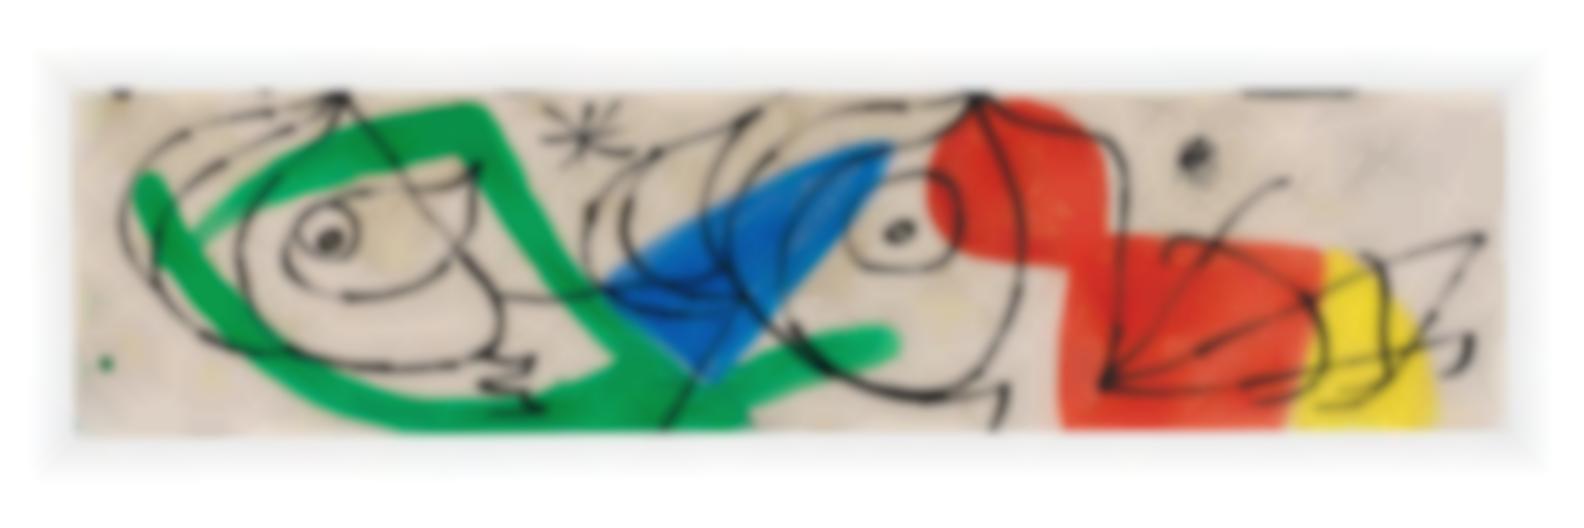 Joan Miro-Untitled-1974